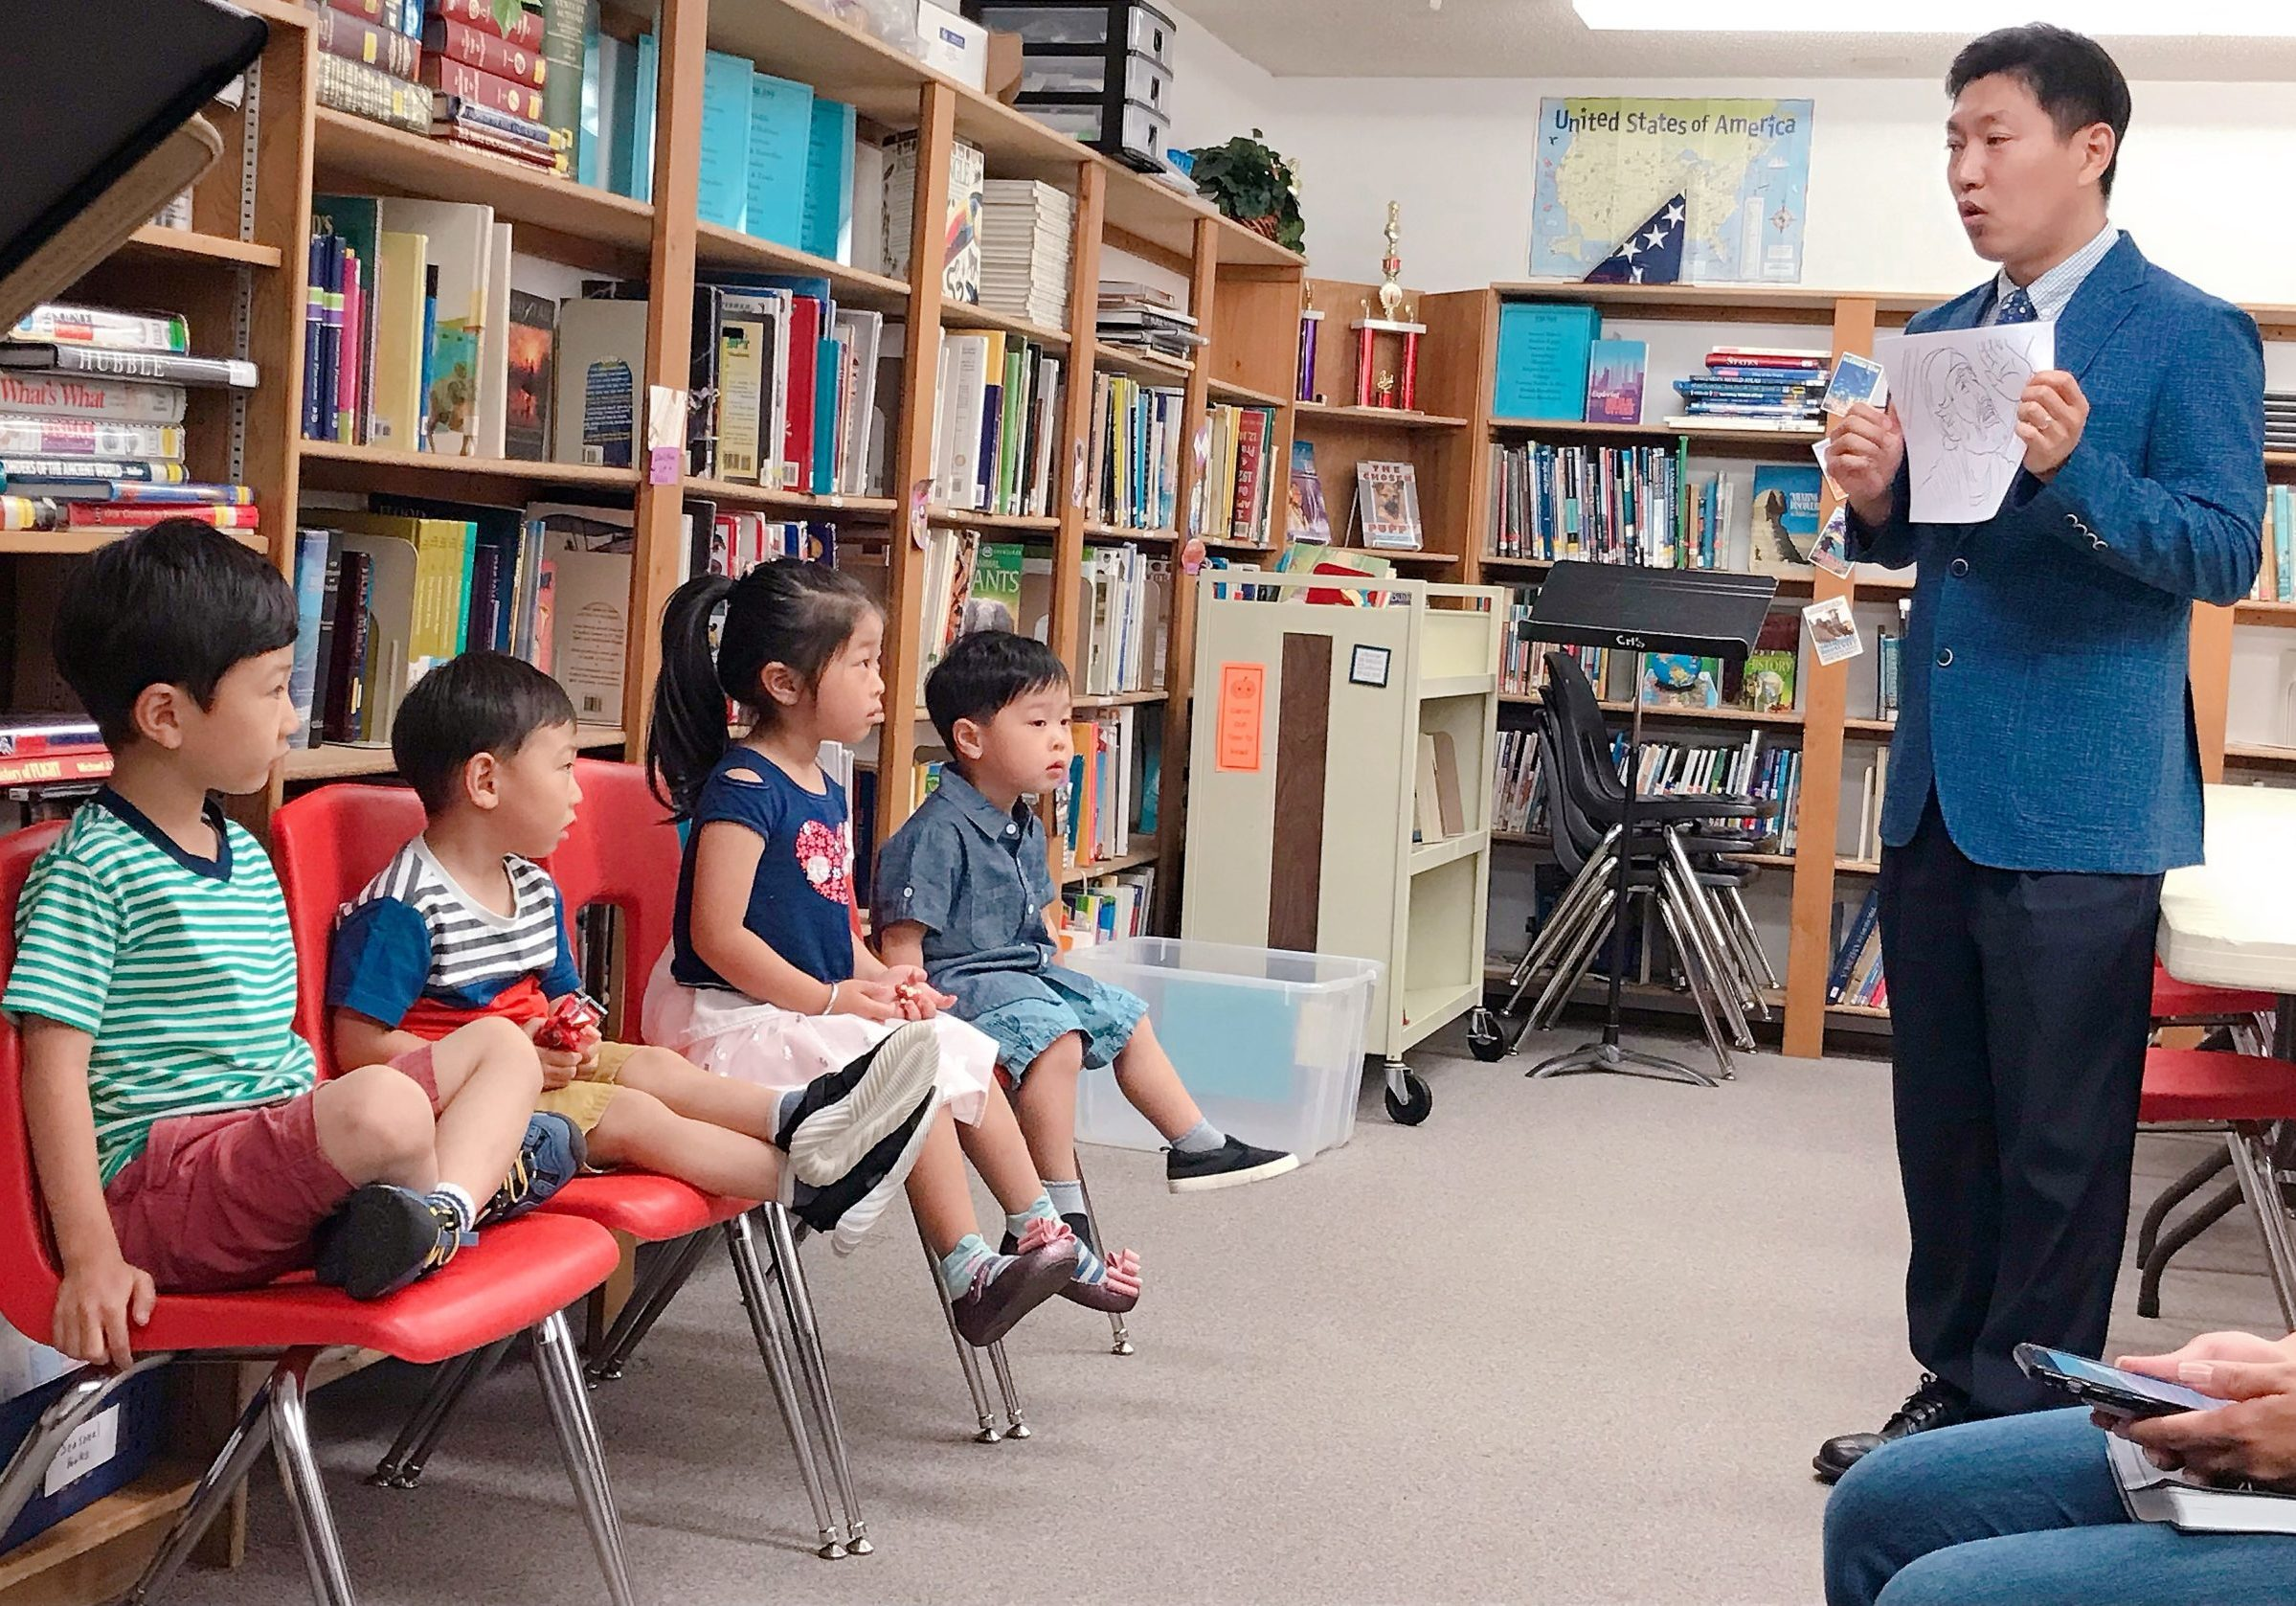 2019, 10 Yong children's message edited